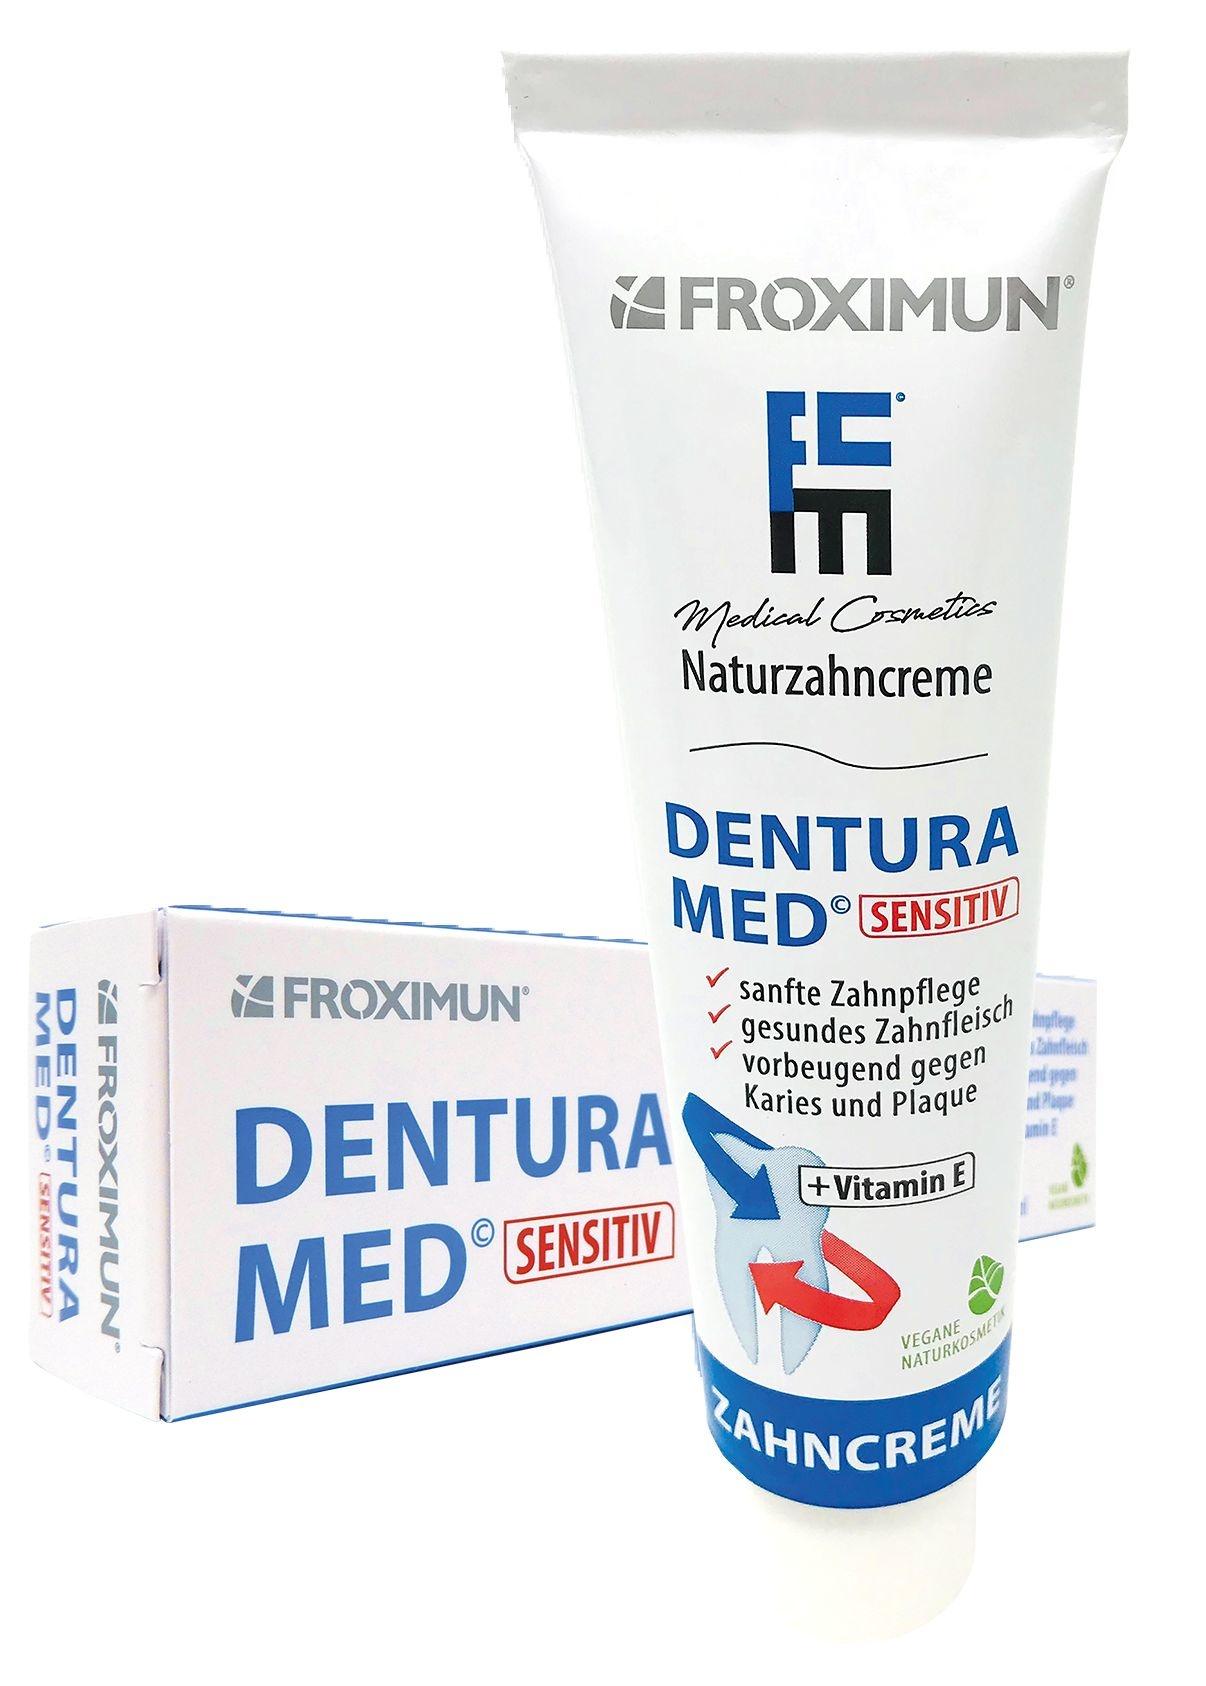 FROXIMUN Tandpasta DenTura met Manc (duoverpakking)